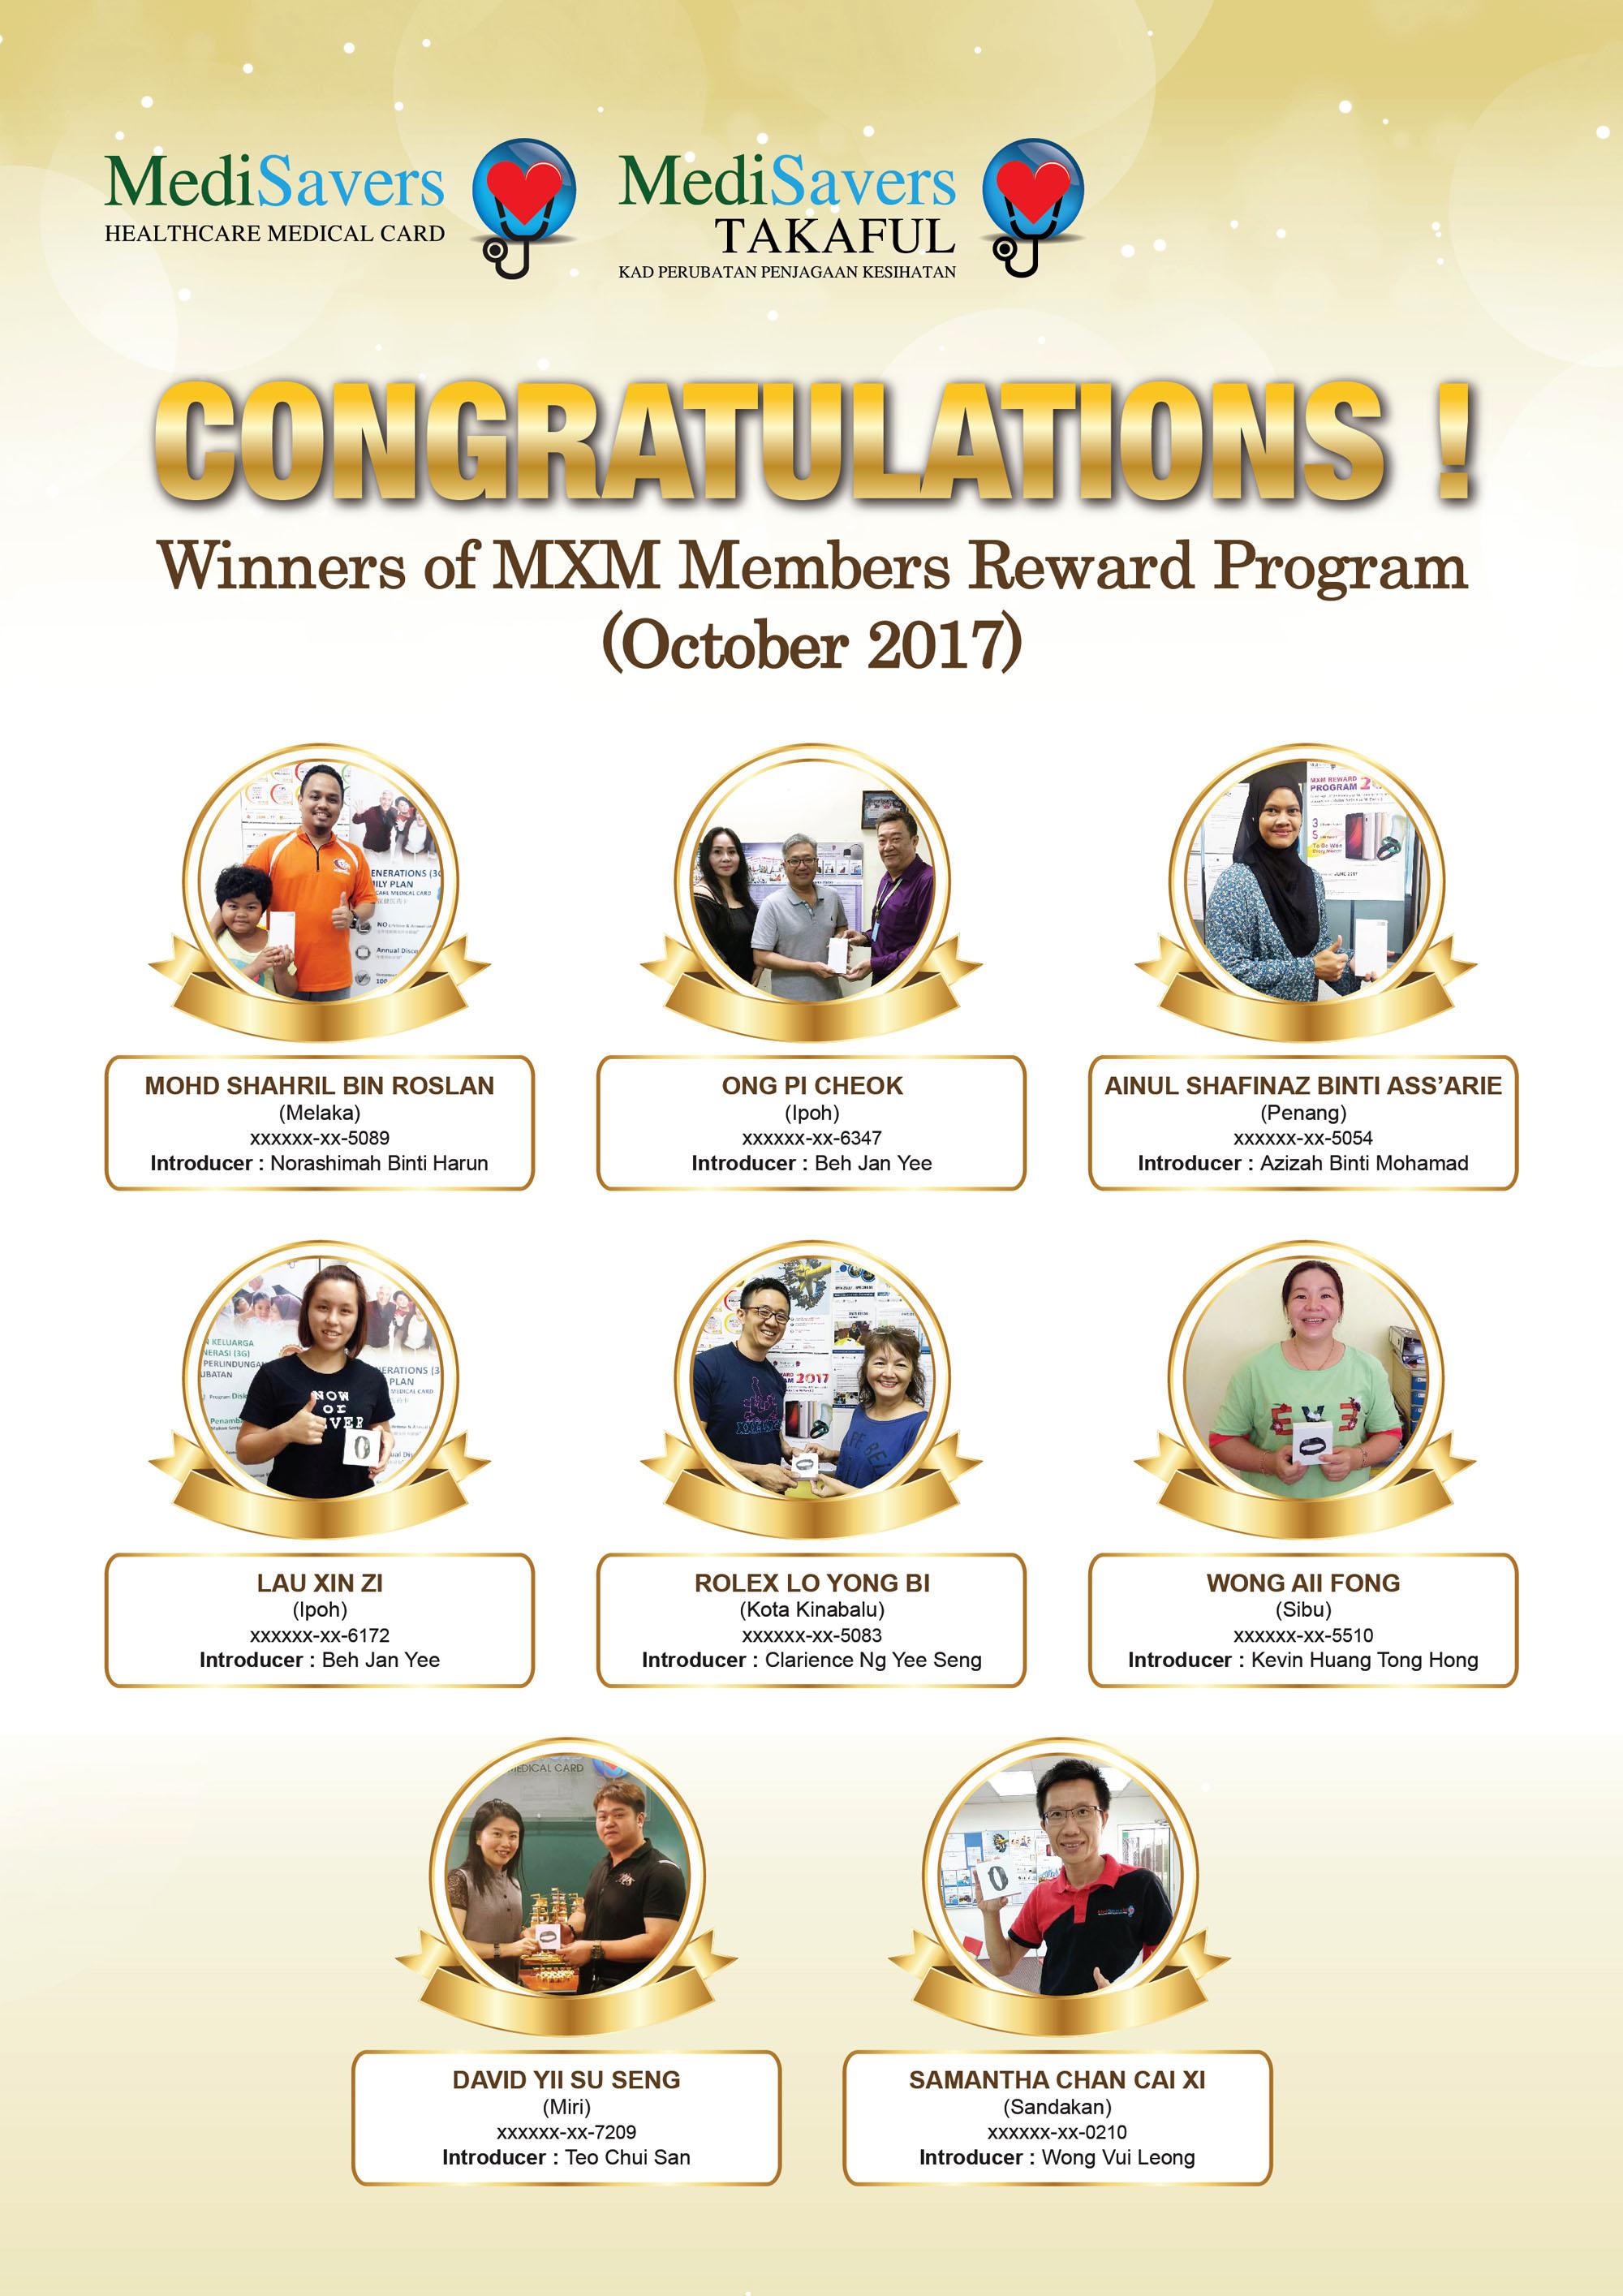 201706_MXM Members Loyalty Program Winner_Website B